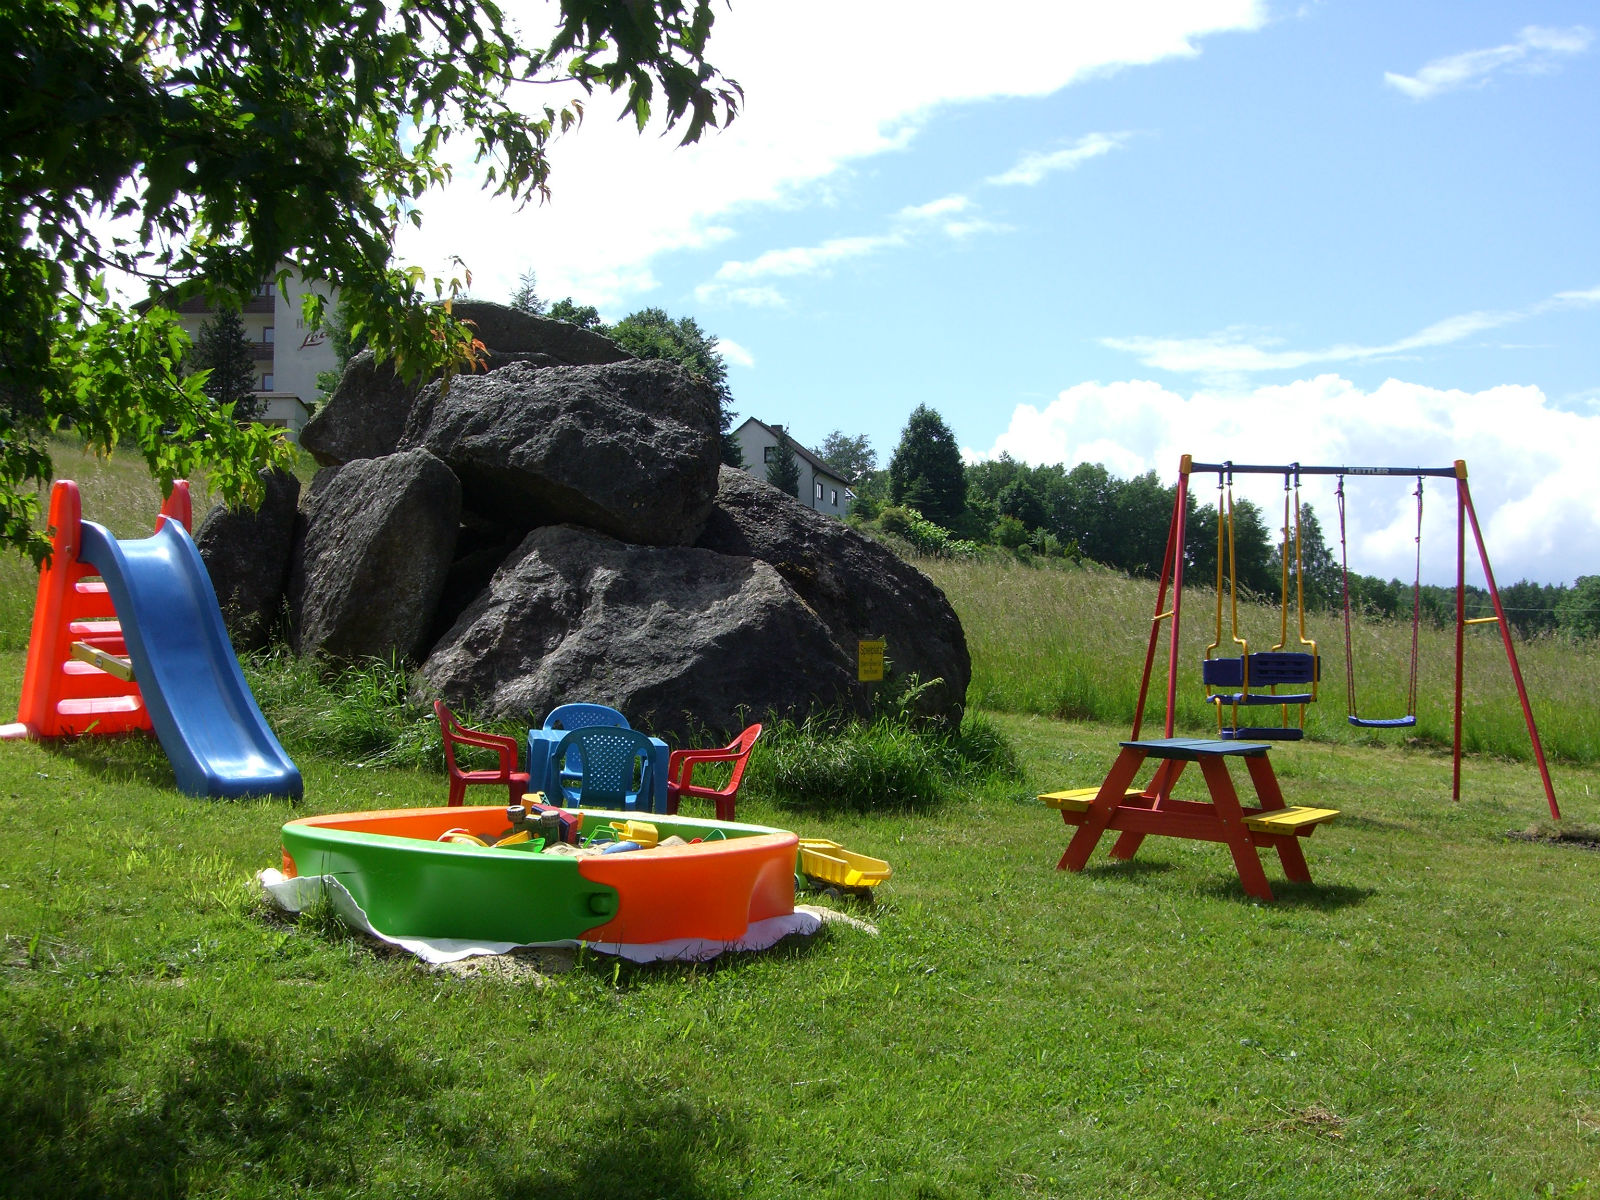 Biergarten-spielplatz-hammerschmiede